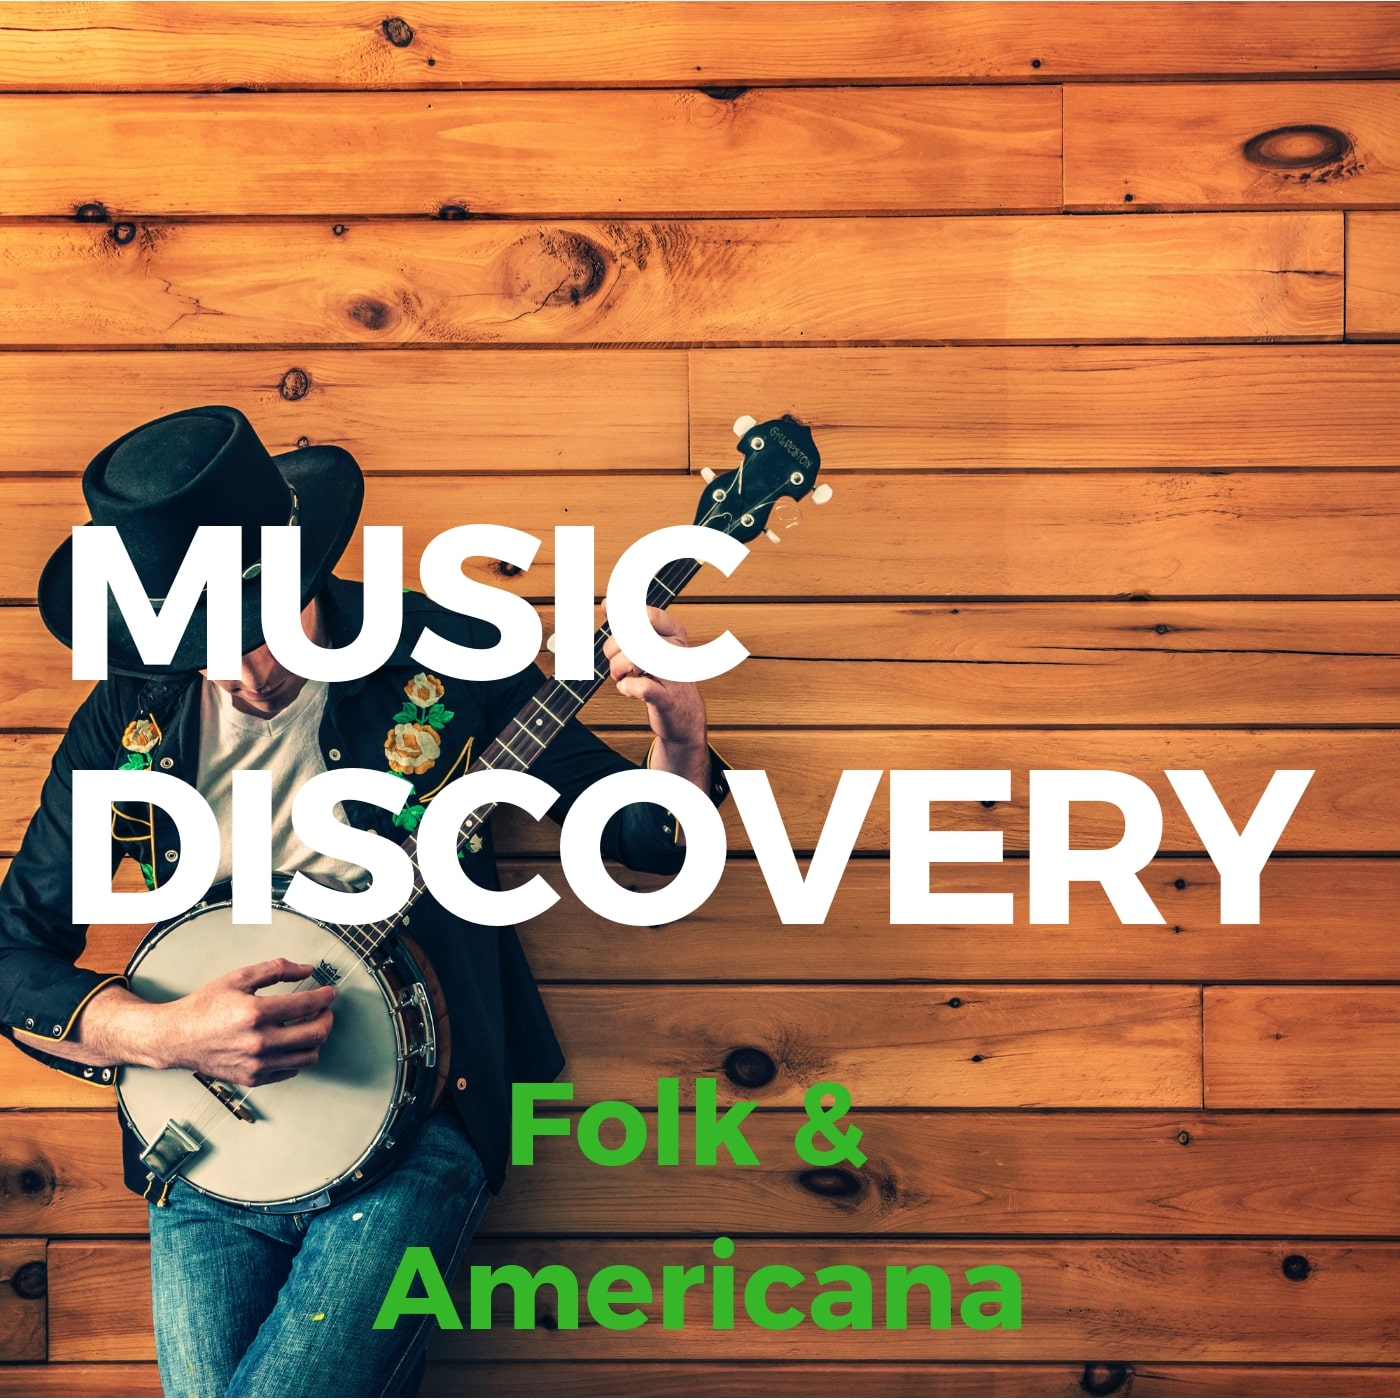 Music Discovery - Folk/Americana Playlist